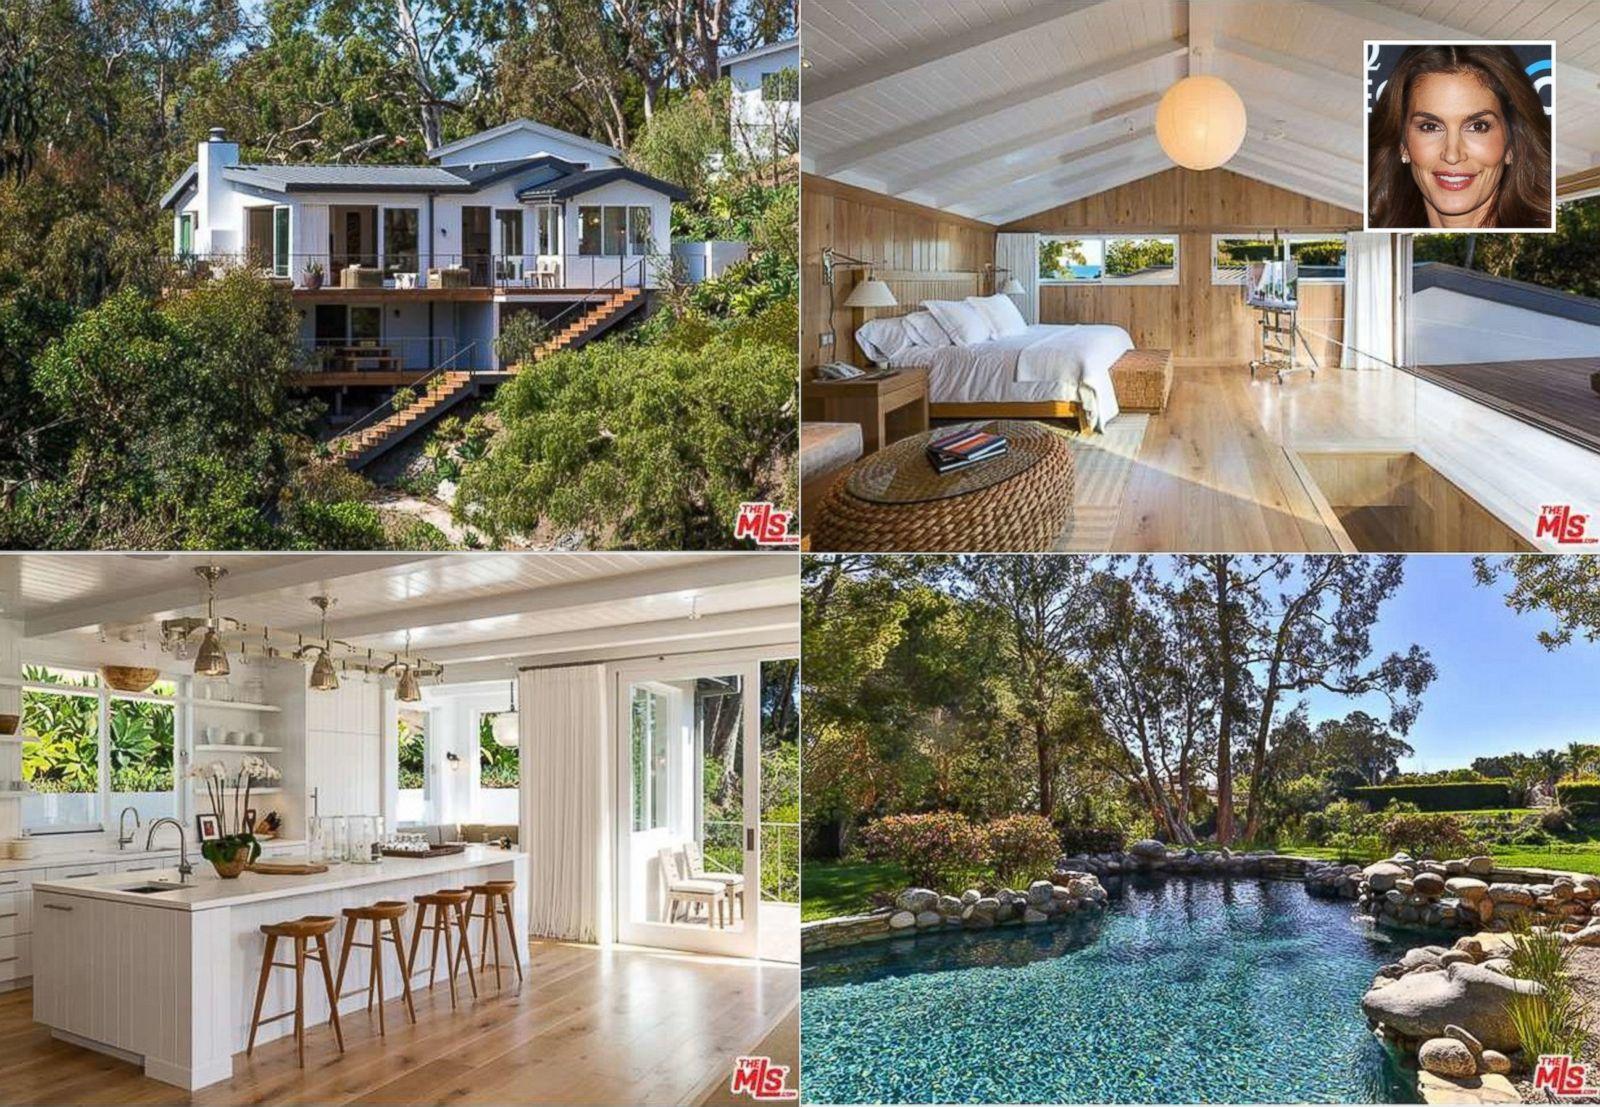 Cindy Crawford Home Cindy Crawford Lists Malibu Home For 155m Abc News